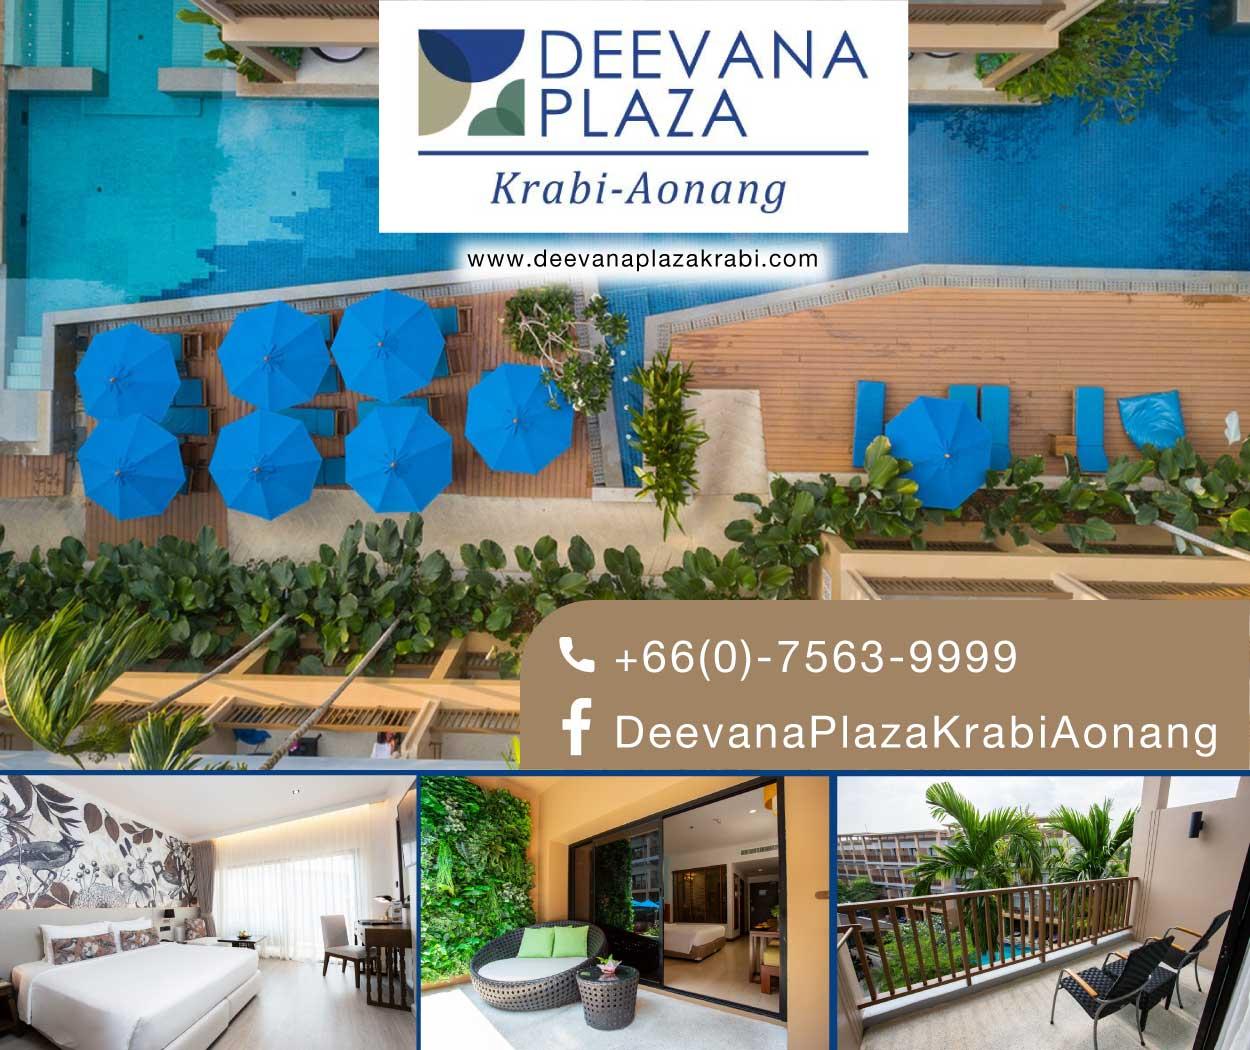 Deevana Plaza Krabi Aonang